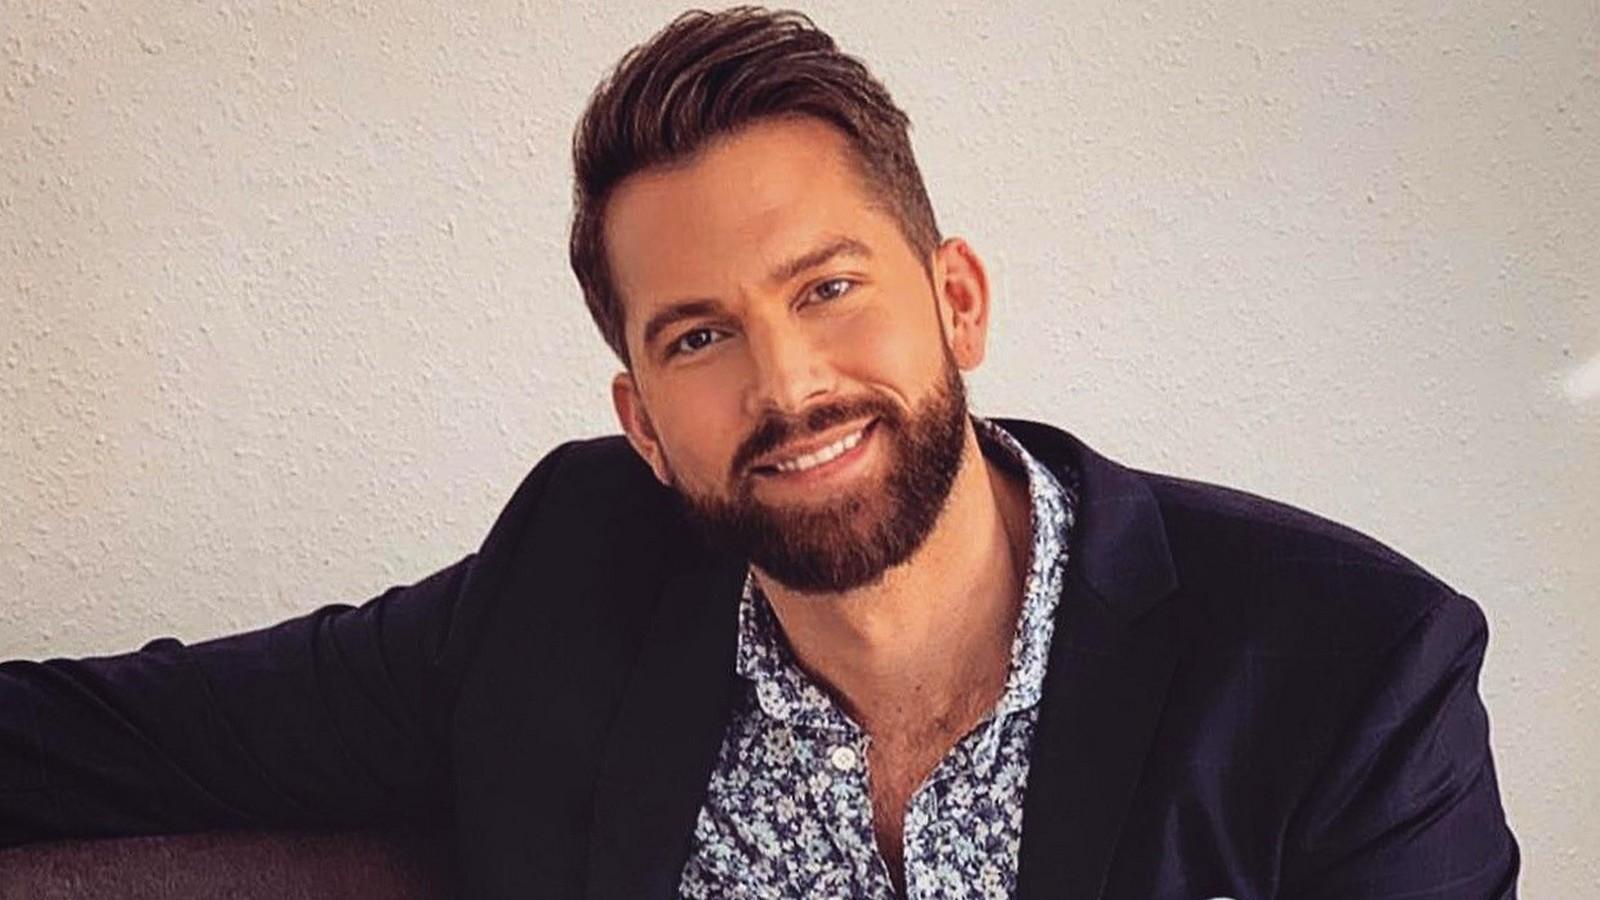 Dschungelshow-Kandidat Oliver Sanne